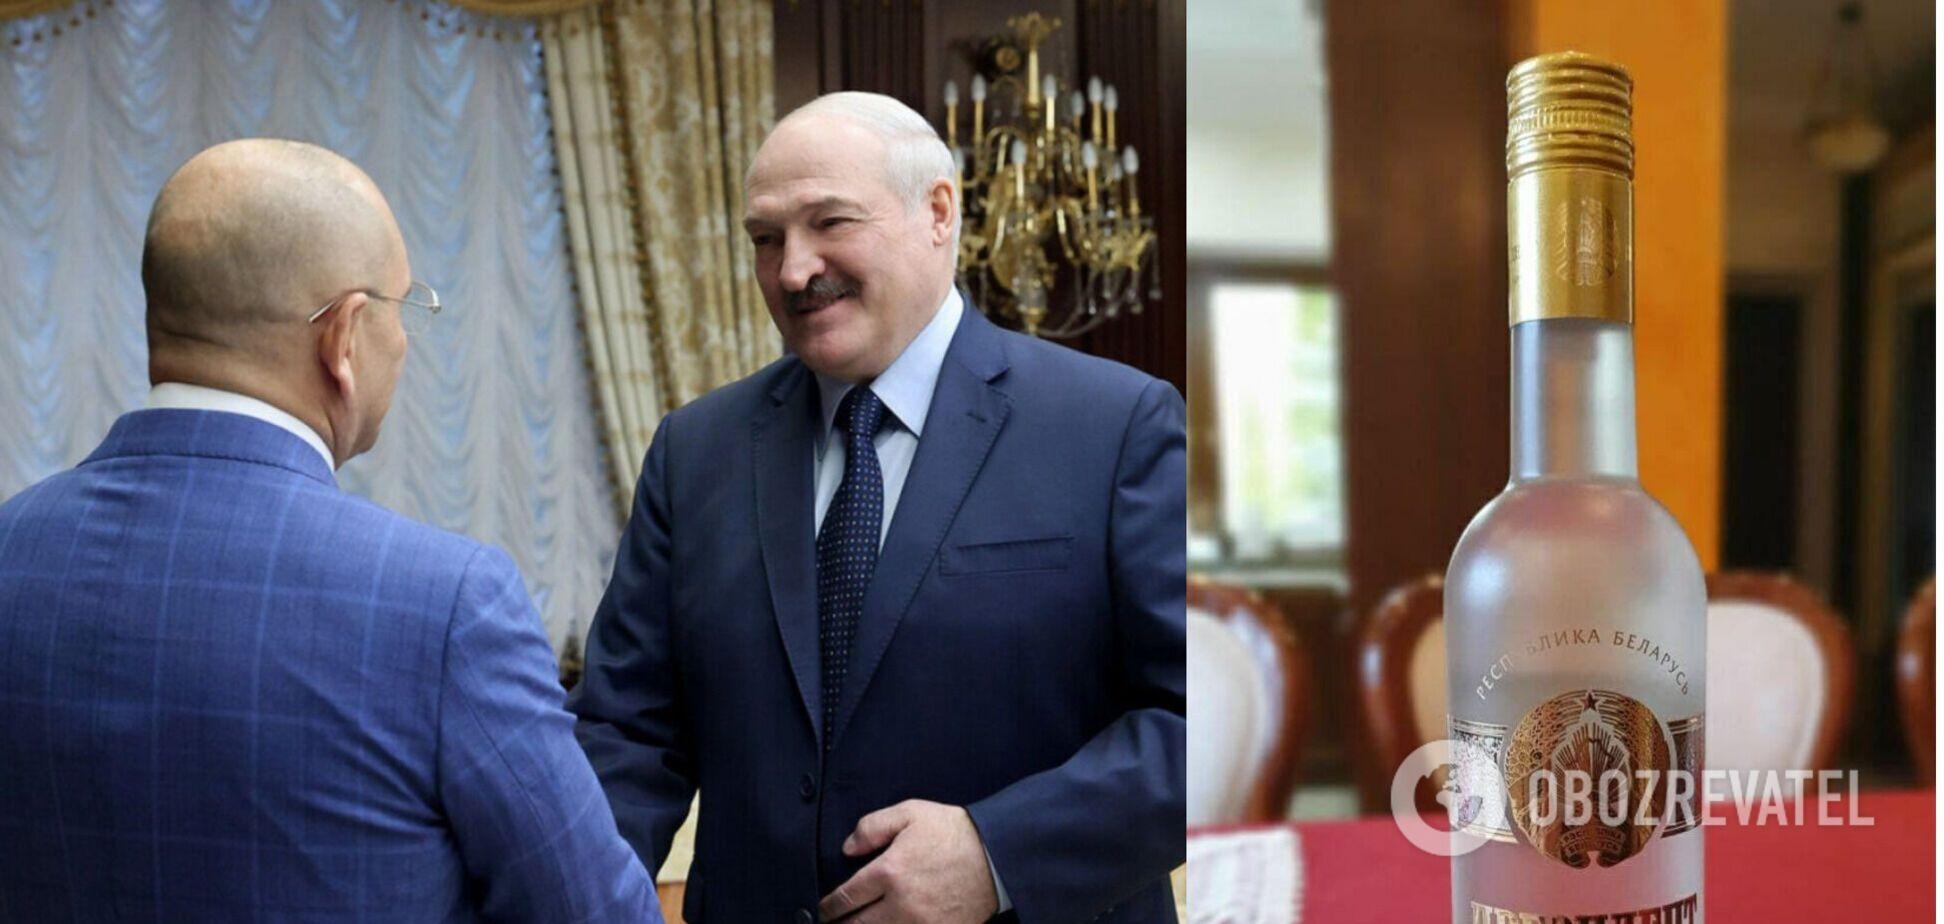 Лукашенко вручил Шевченко 'набор президента': 'слуга народа' похвастался подарками. Фото